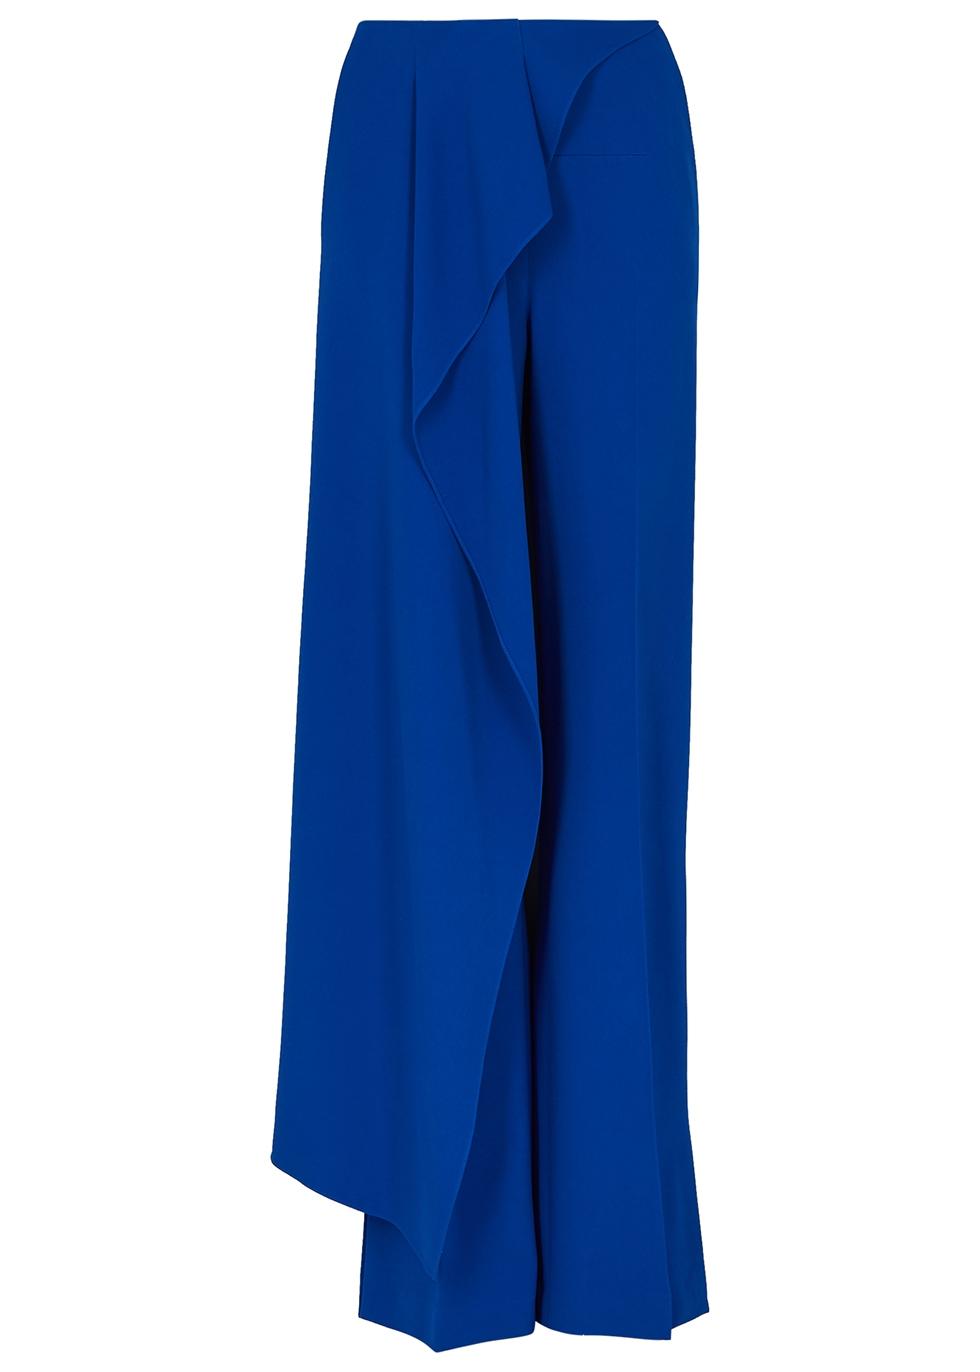 Griffith royal blue straight-leg trousers - Roland Mouret